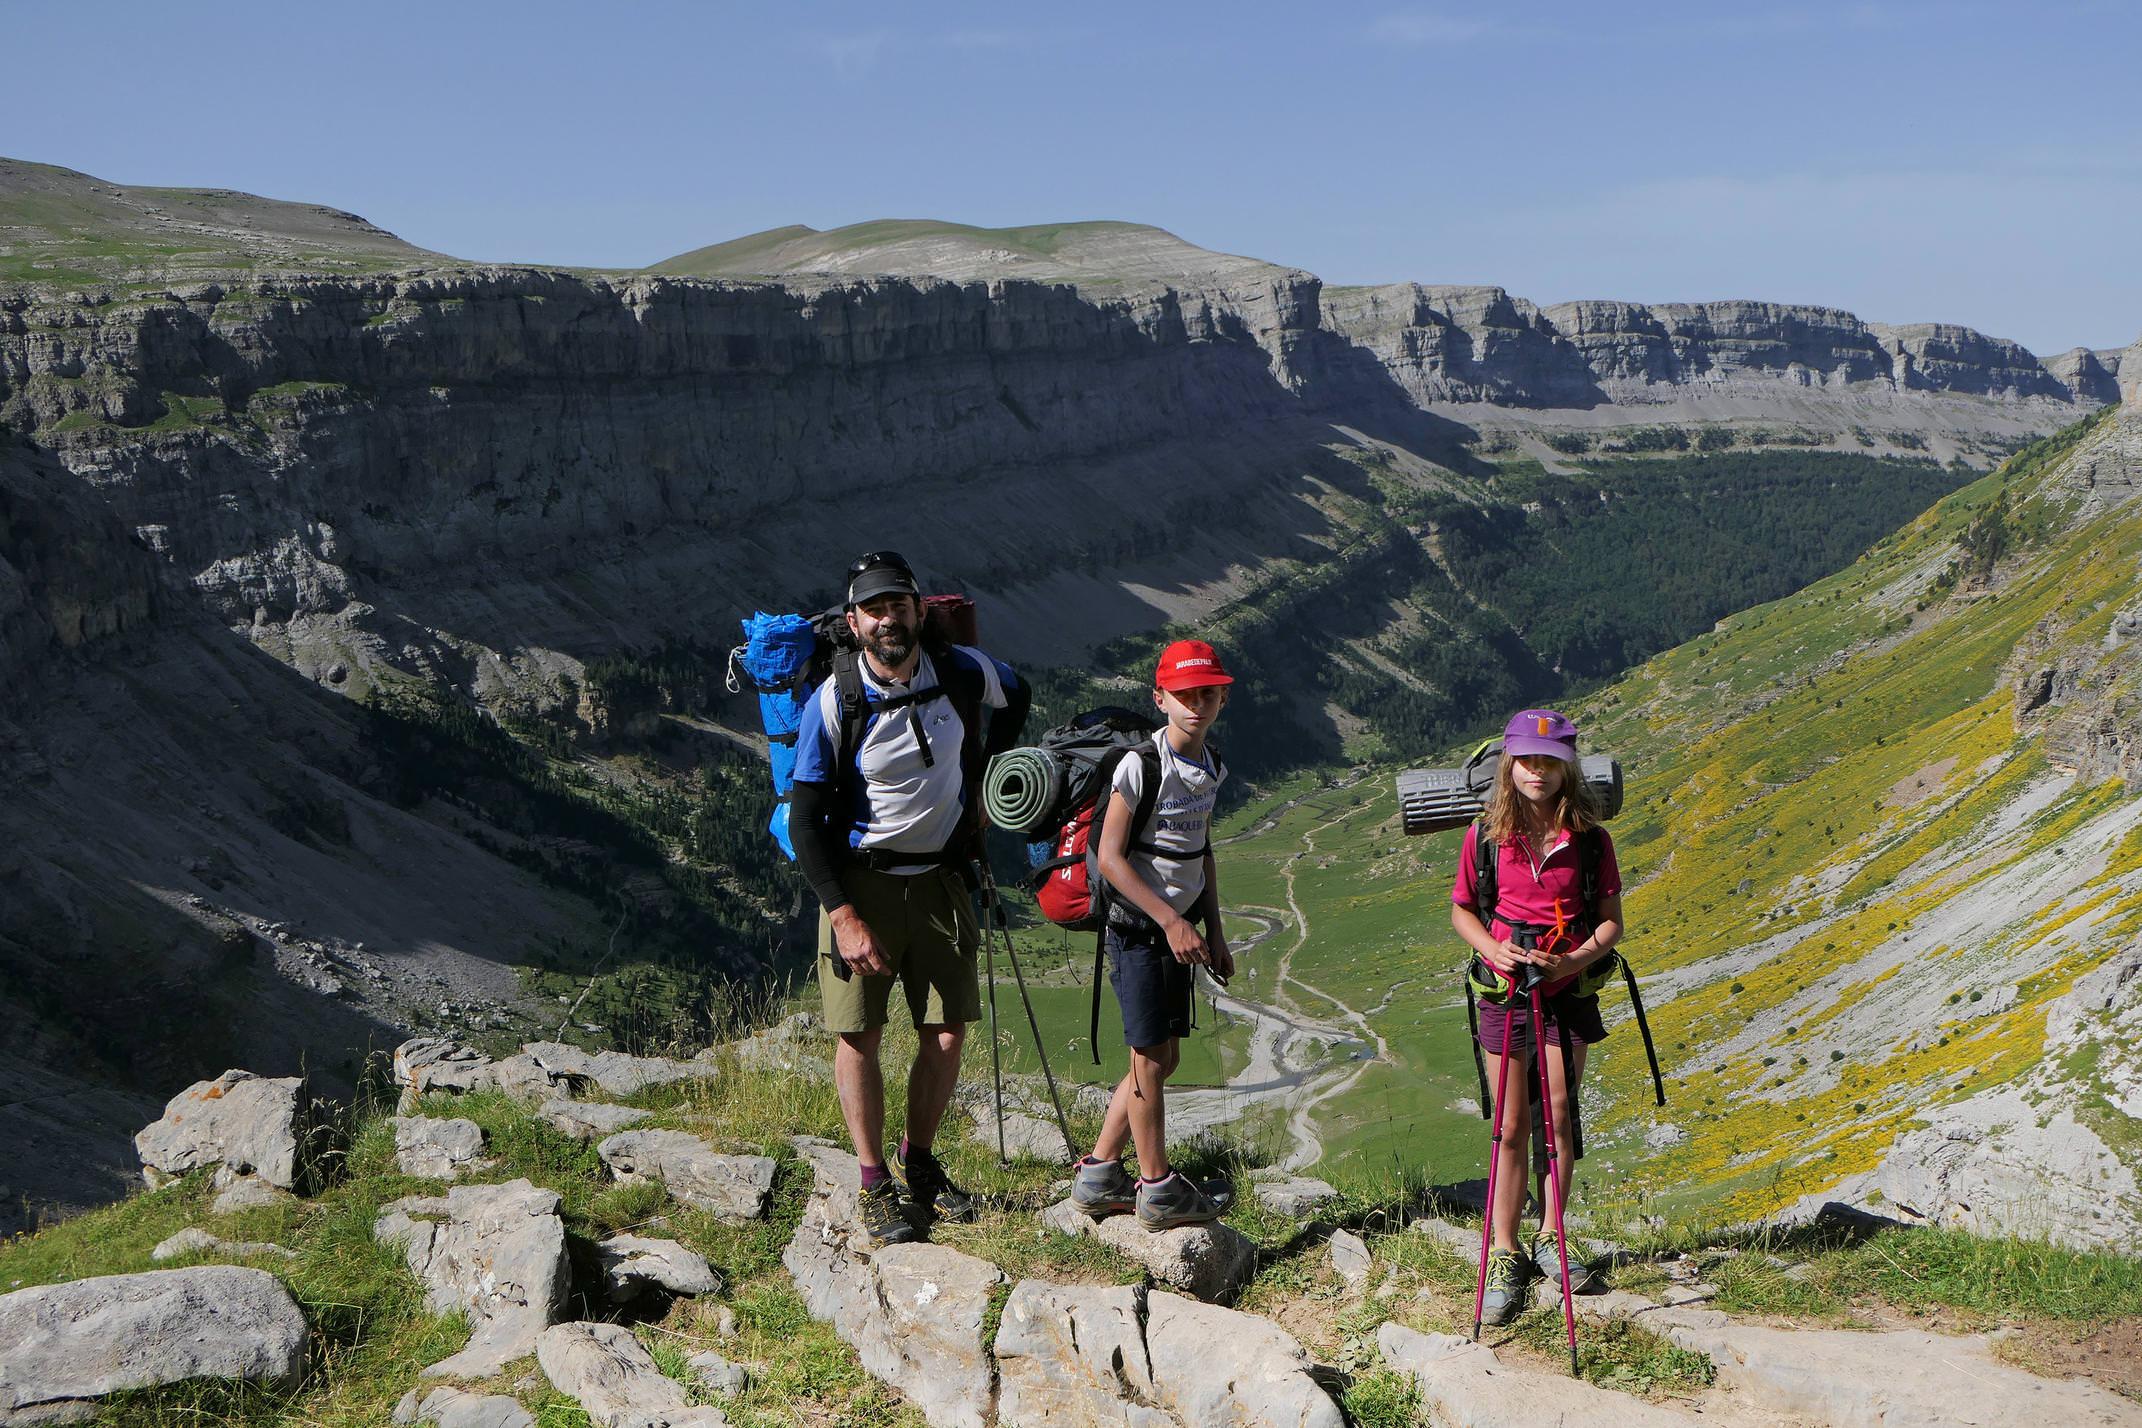 Spain huesca aragon pyrenees ordesa kid 2 family hiker upper valley monte perdido israel family c diego